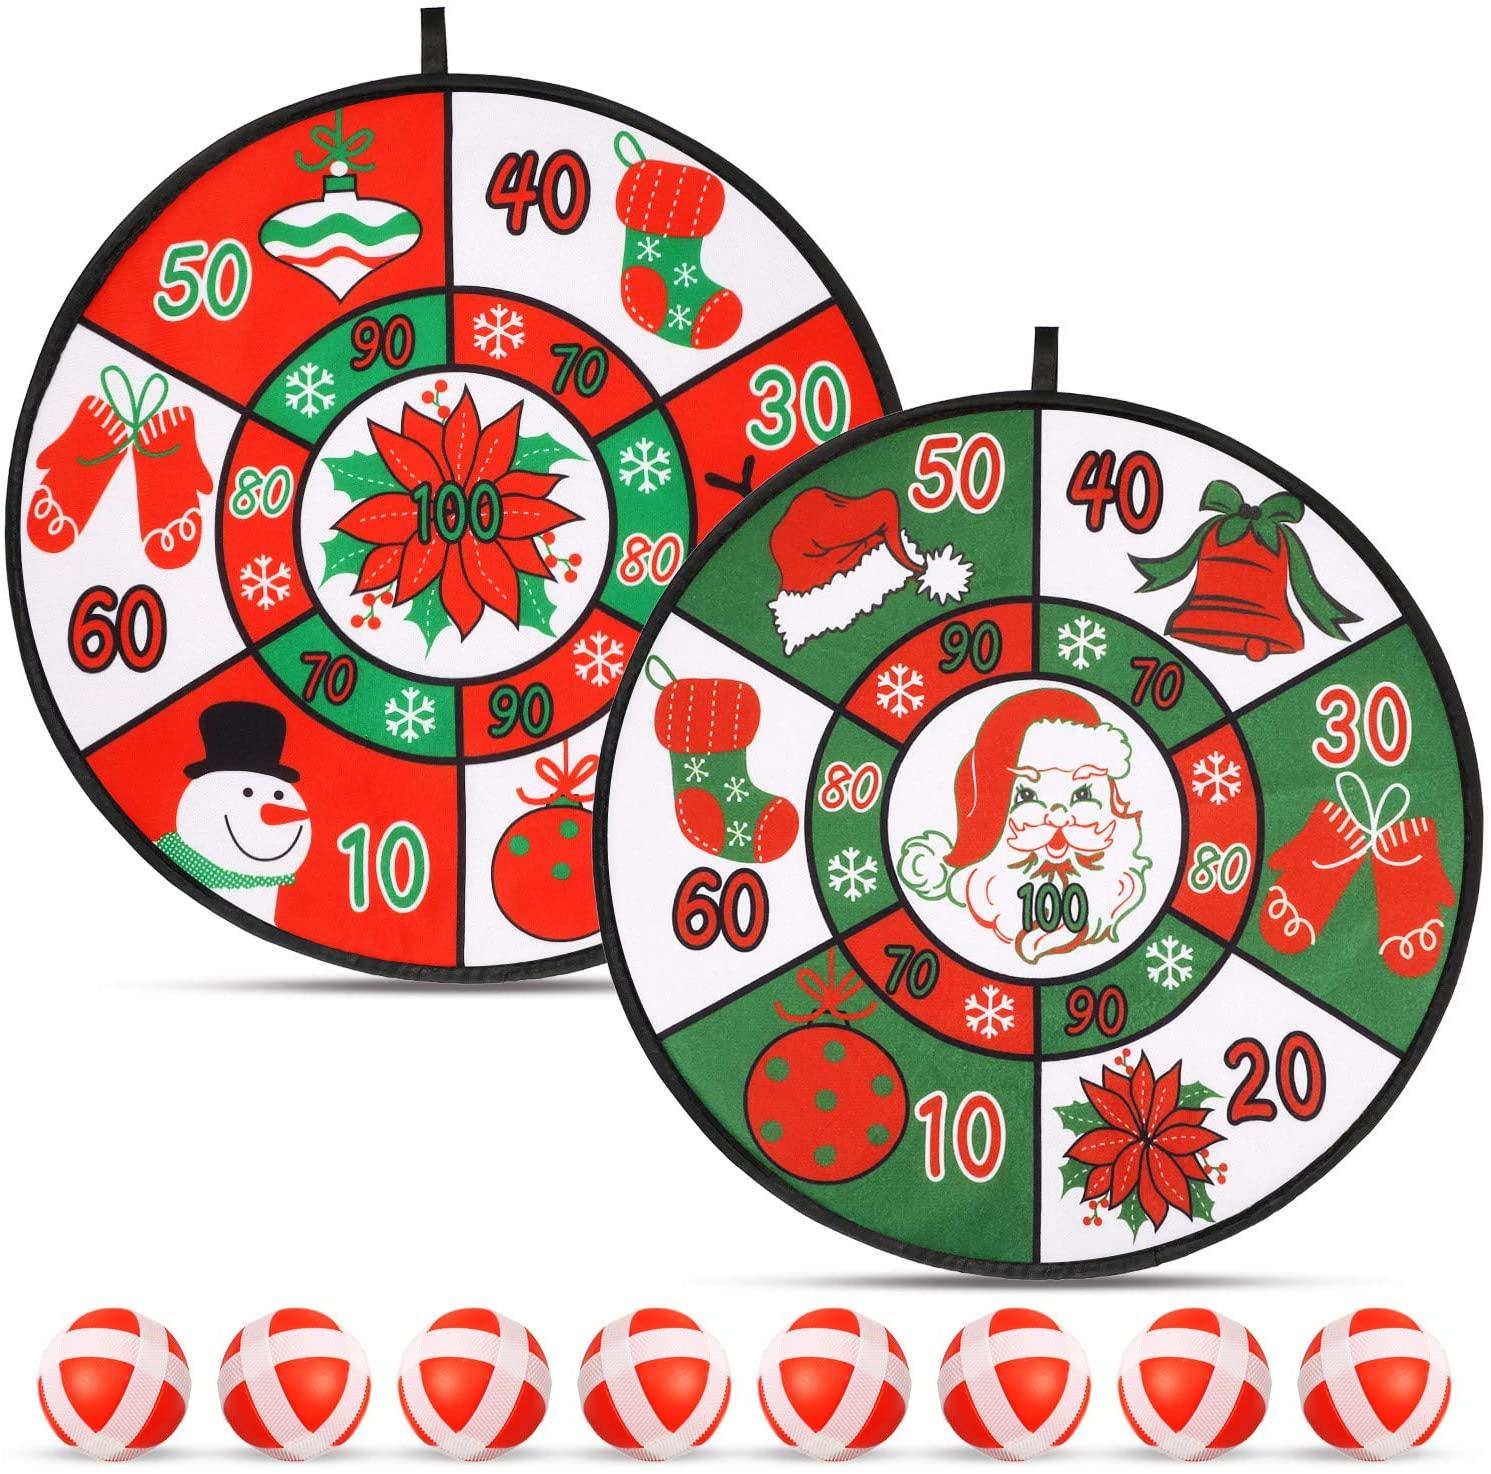 Christmas Dart Board Sticky Balls Toys Games Safe Classic Dartboard Set for Boys Girls, 2 Dart Board and 8 Balls